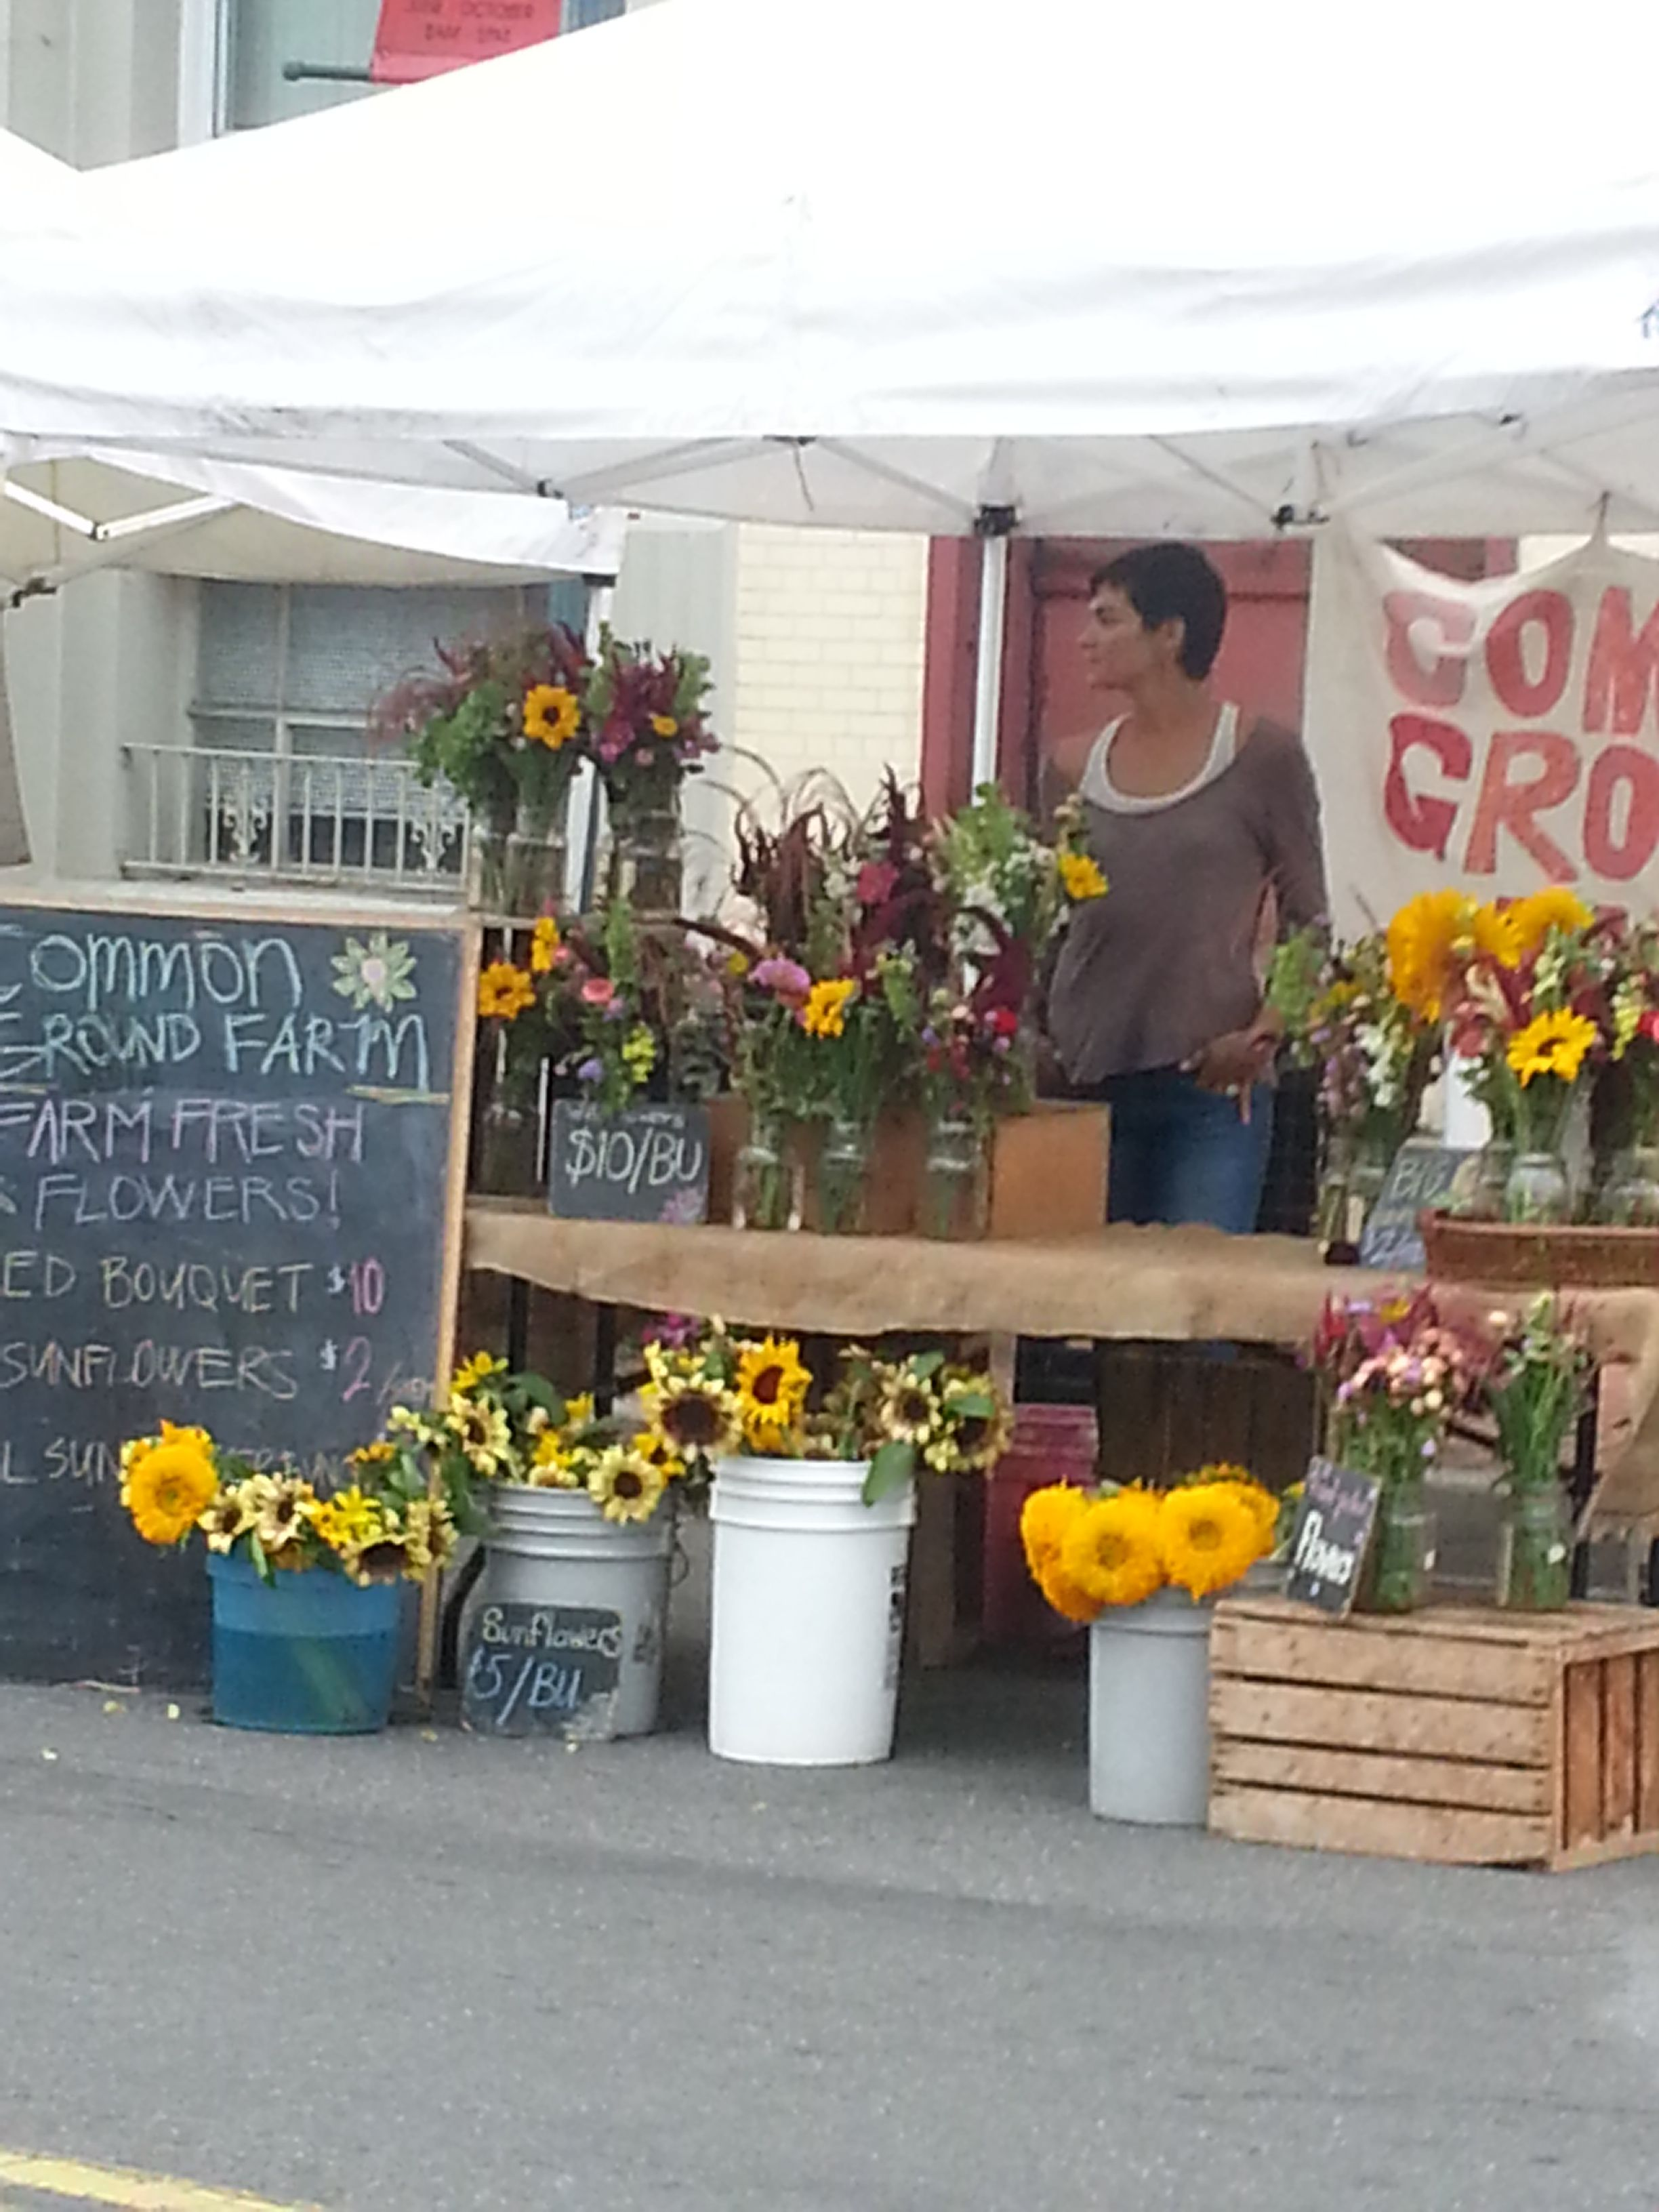 Common Ground flower stand